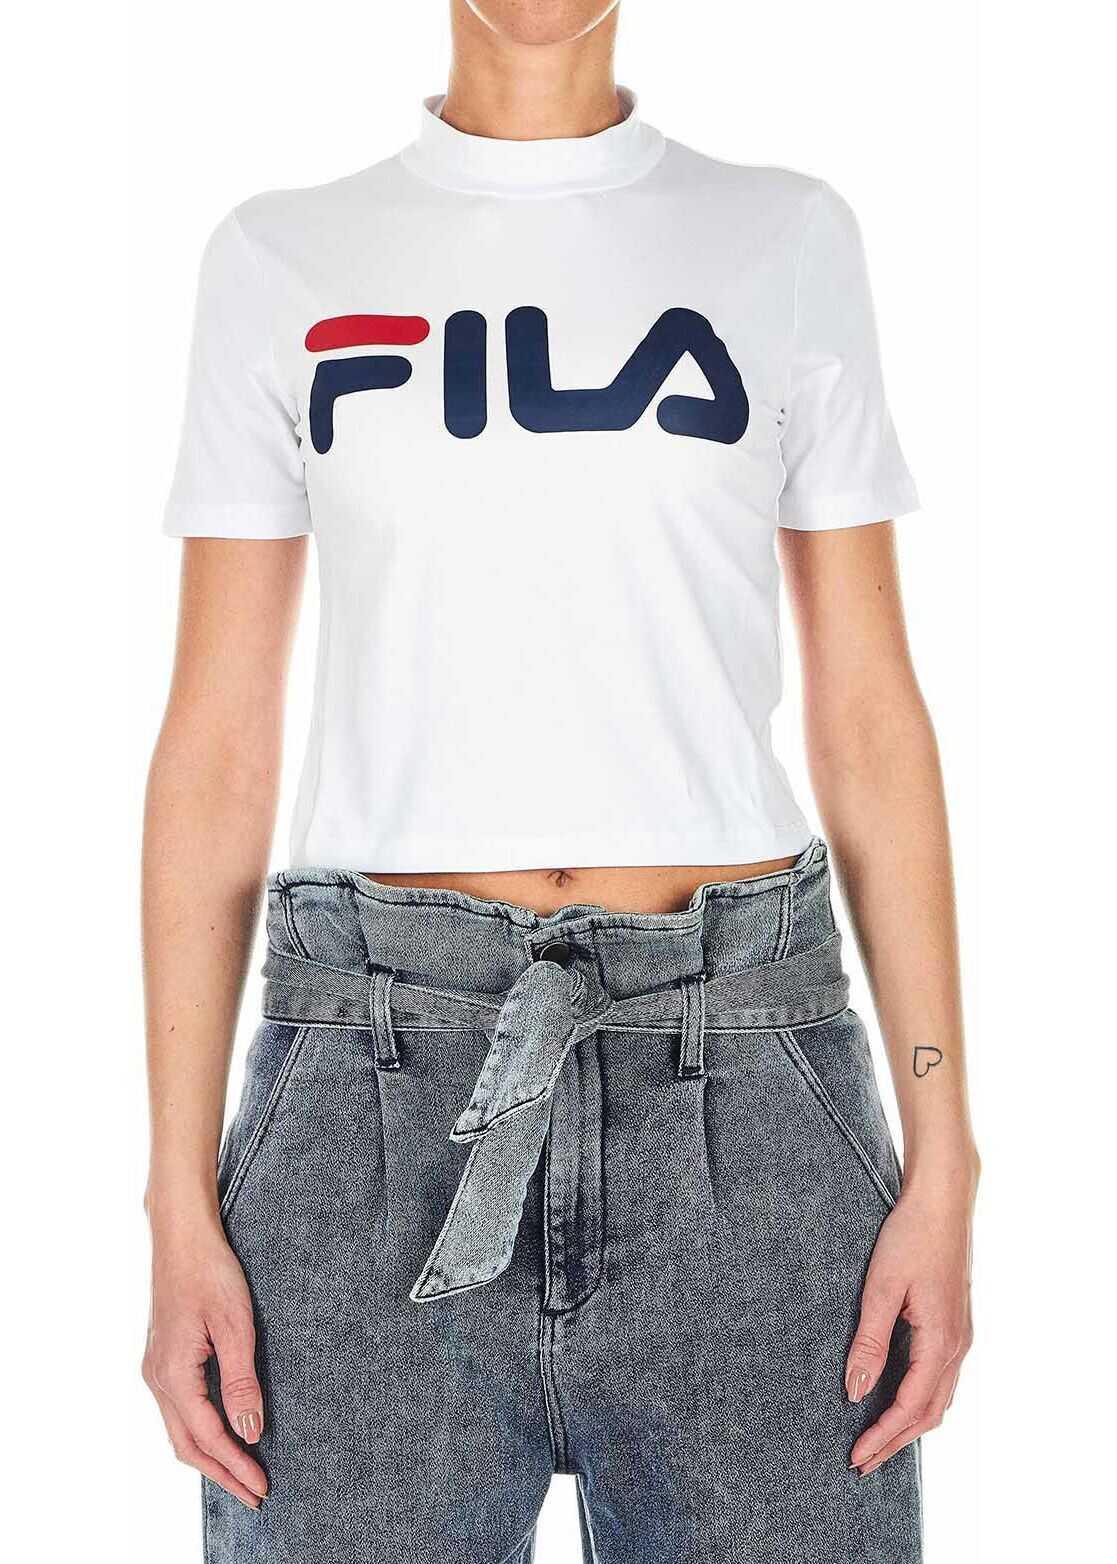 Fila Turtle T-shirt White